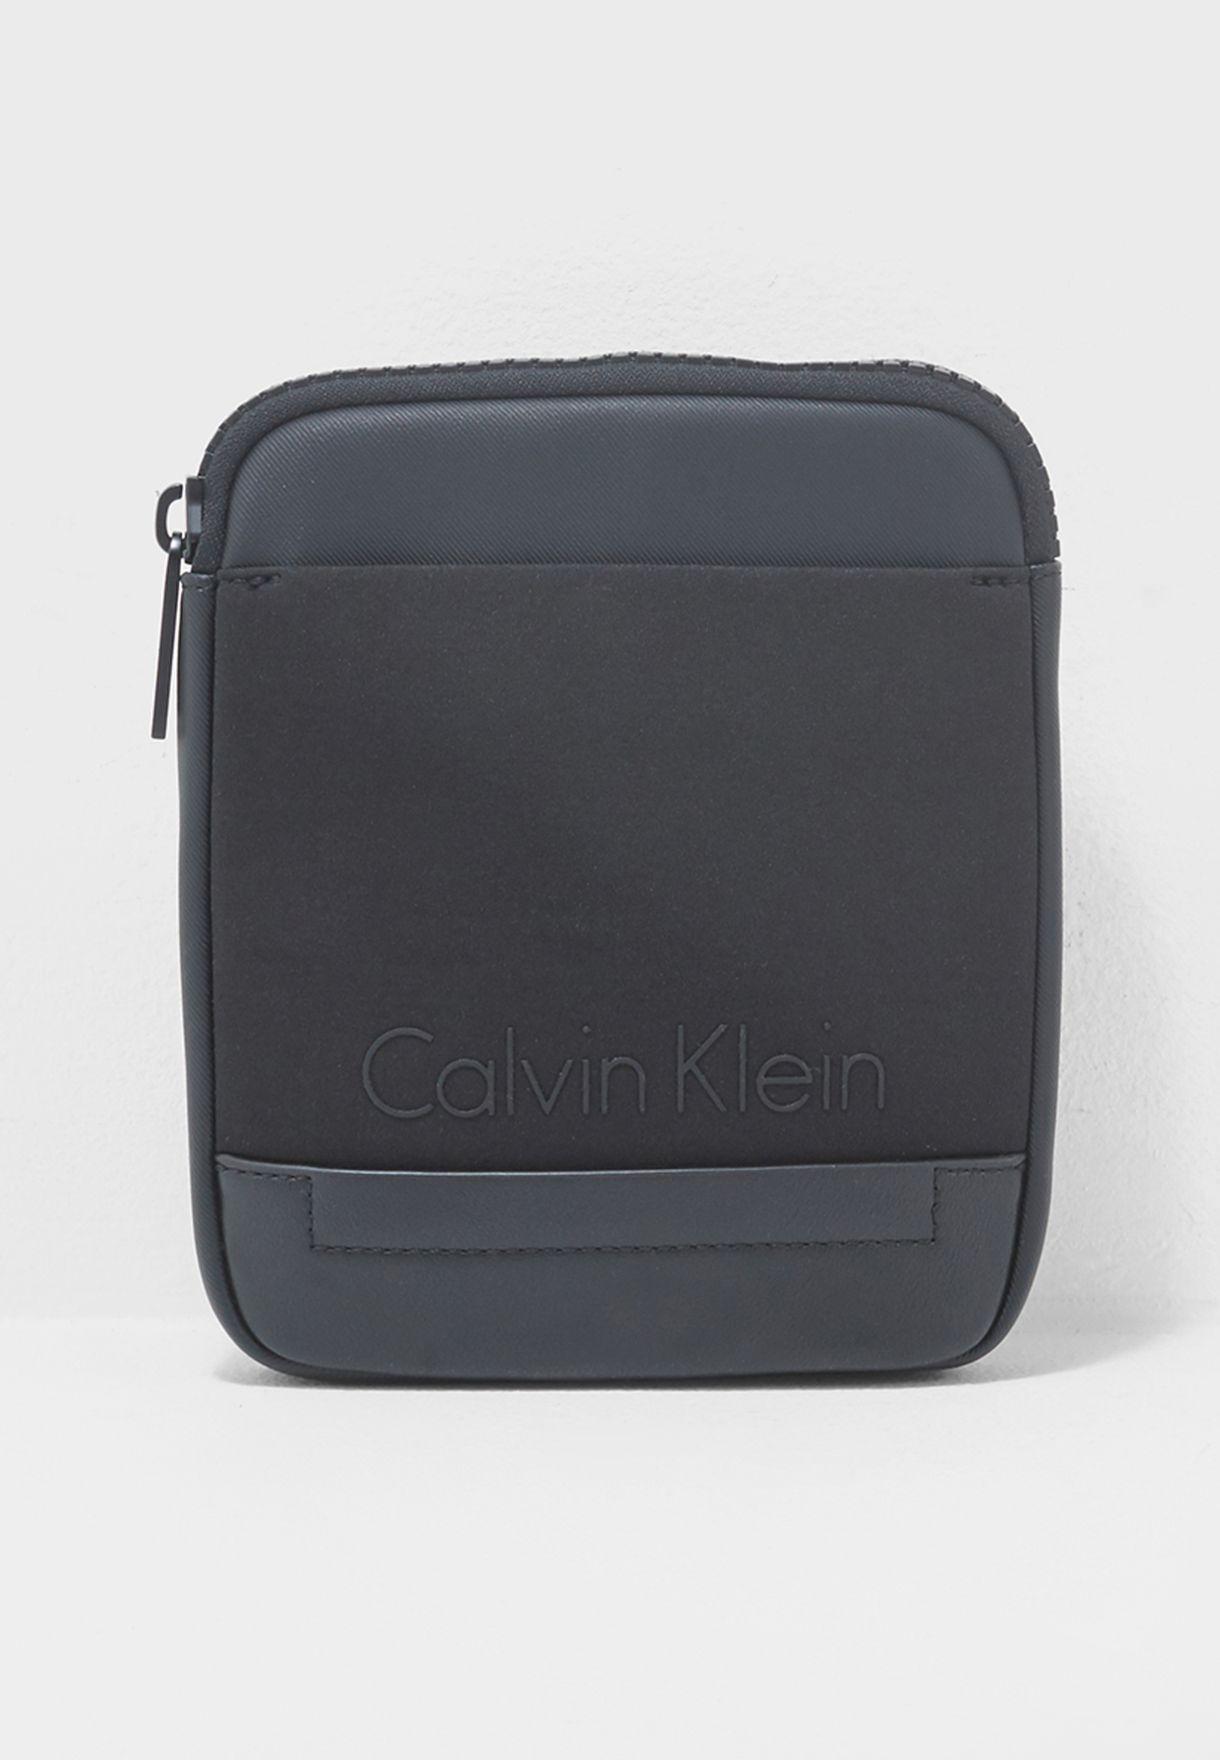 Caillou Mini Messenger